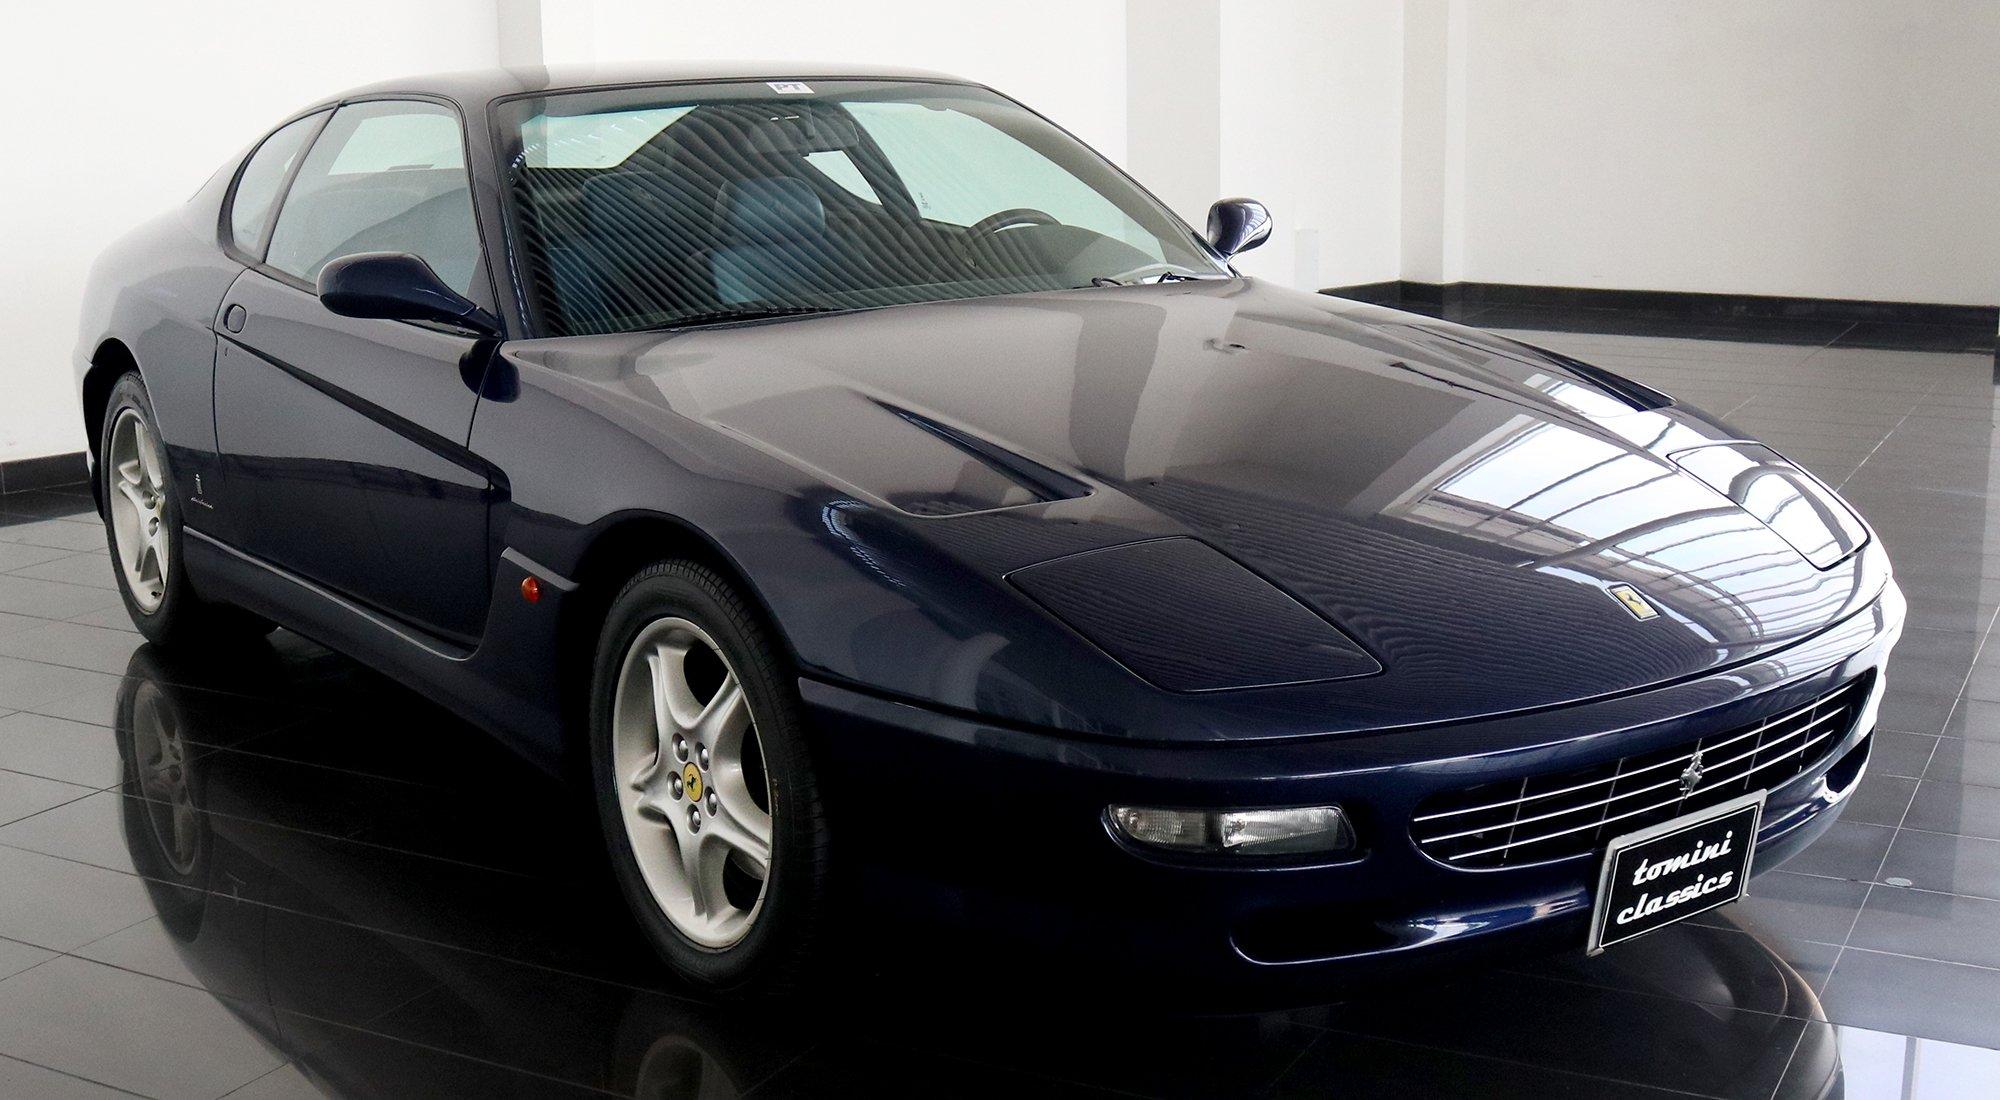 1995 Ferrari 456 In Dubai Dubai United Arab Emirates For Sale 10618739